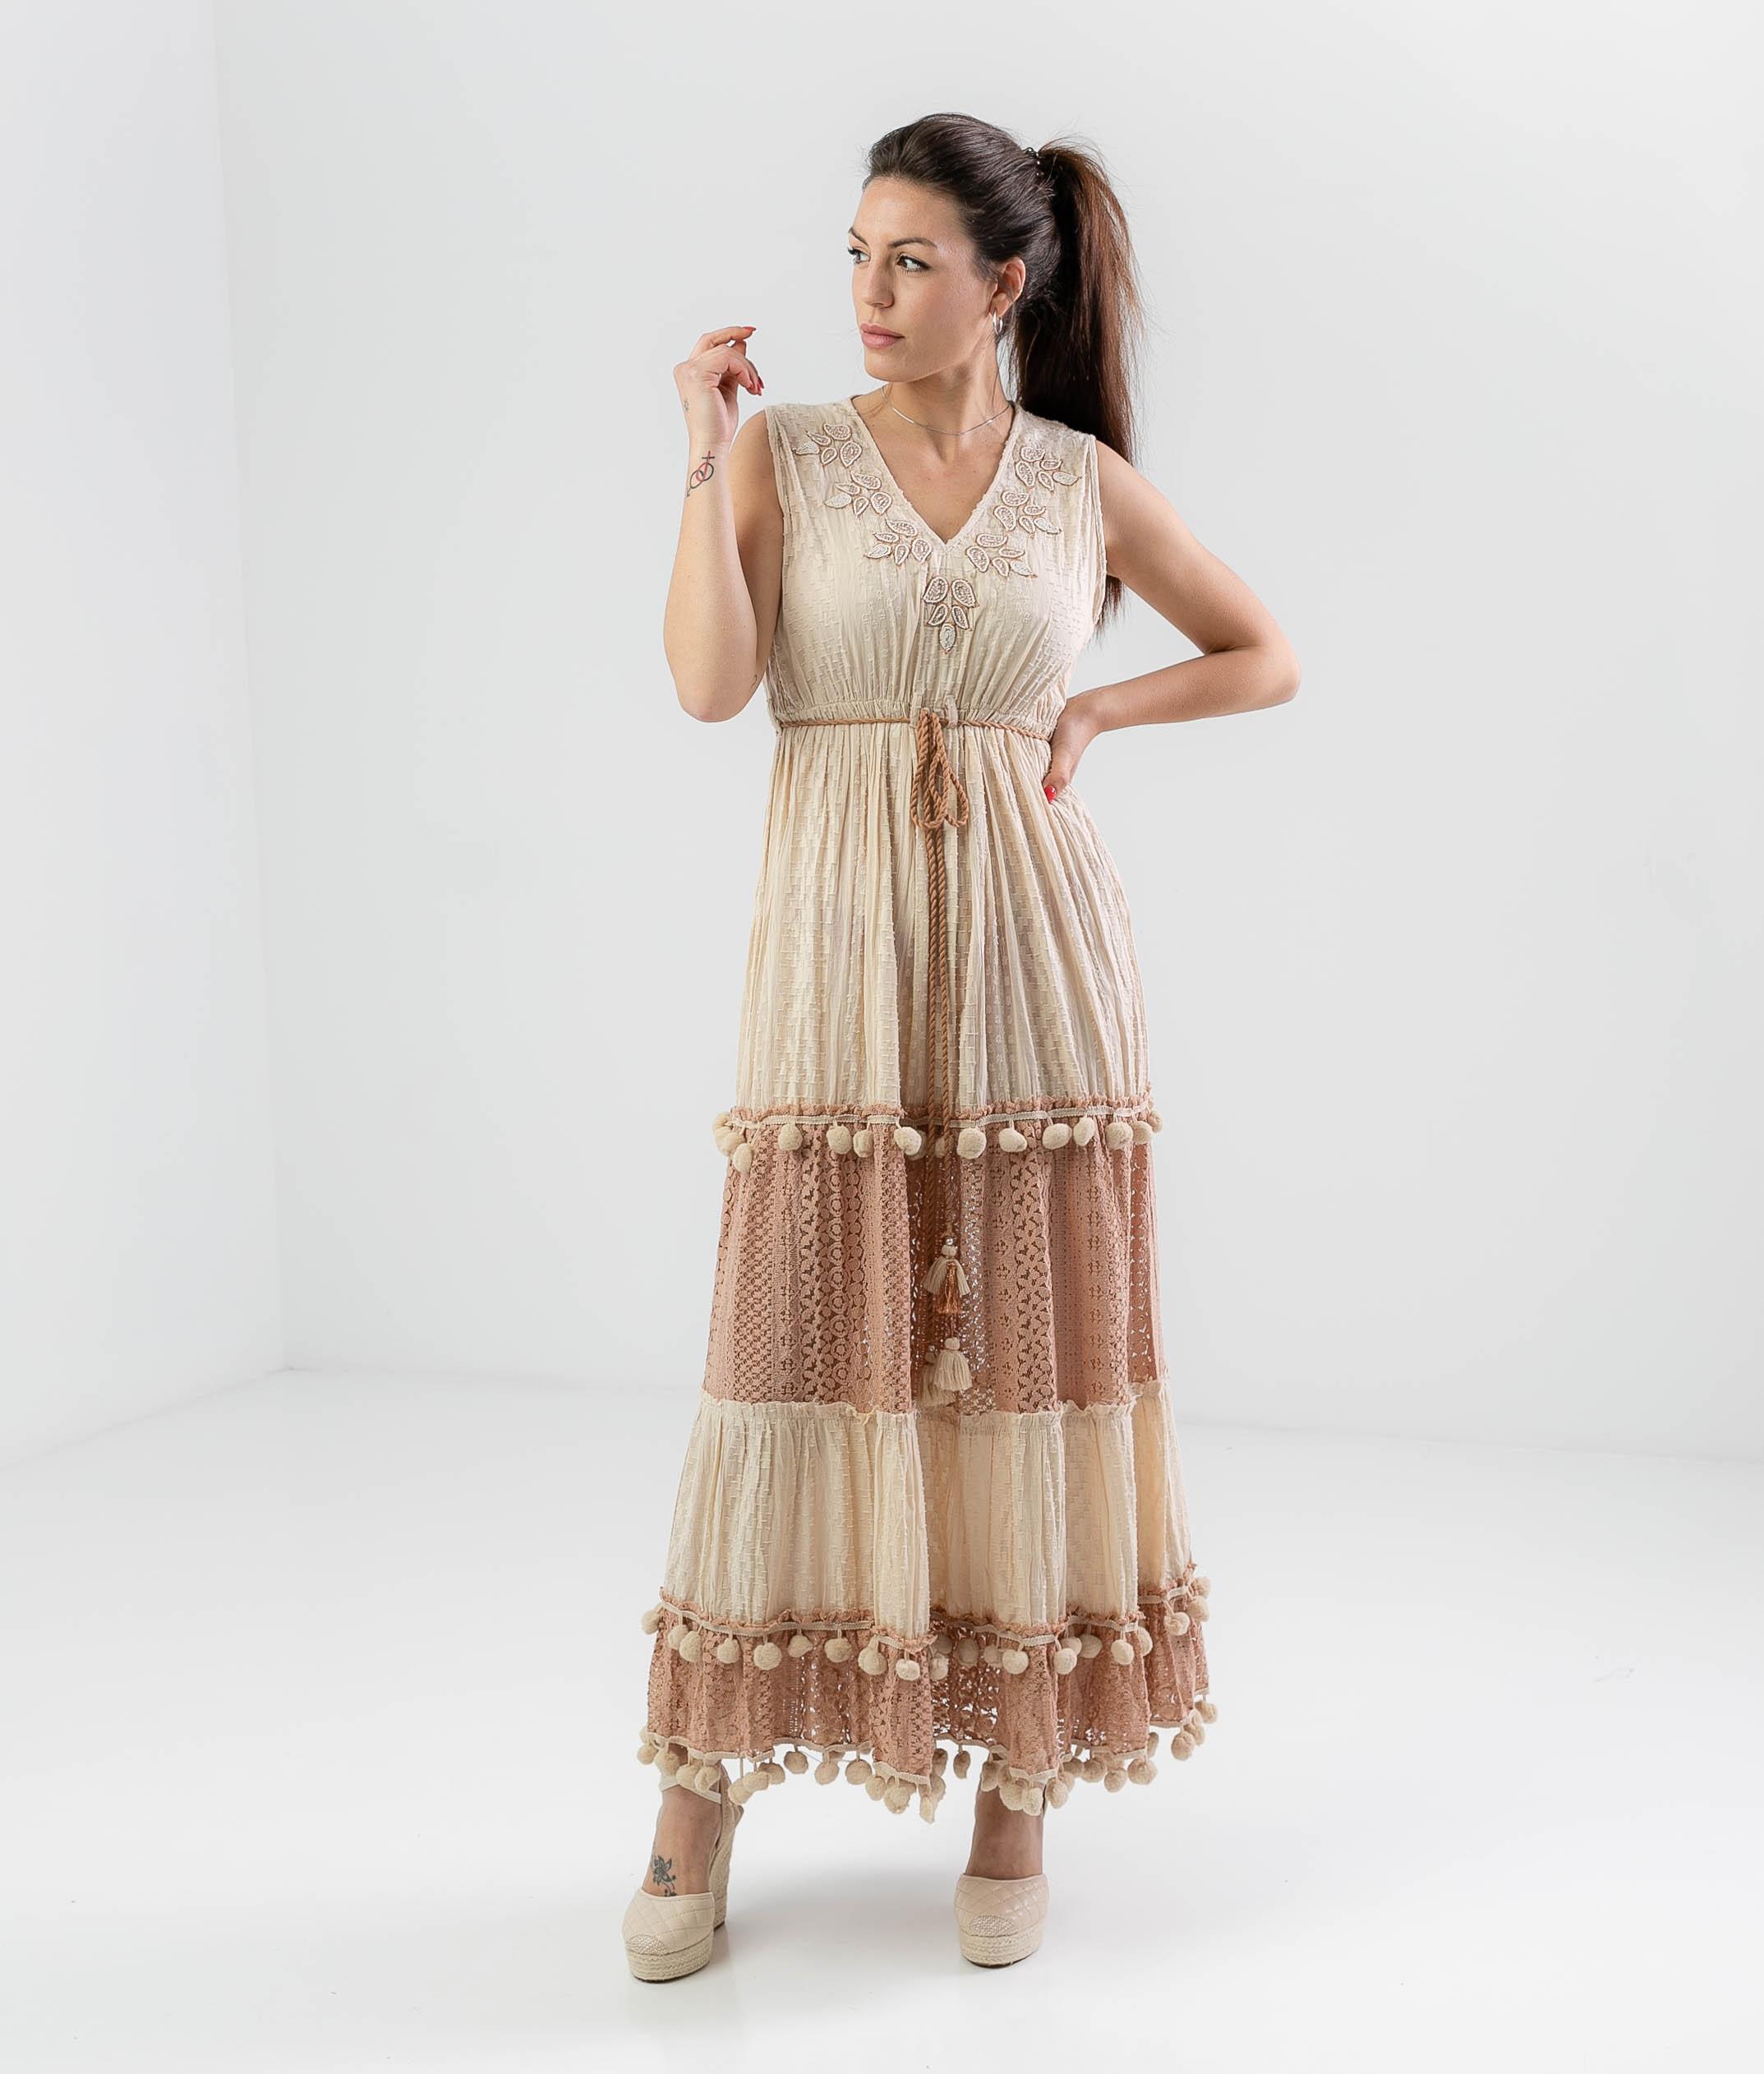 OCHILER DRESS - BEIGE